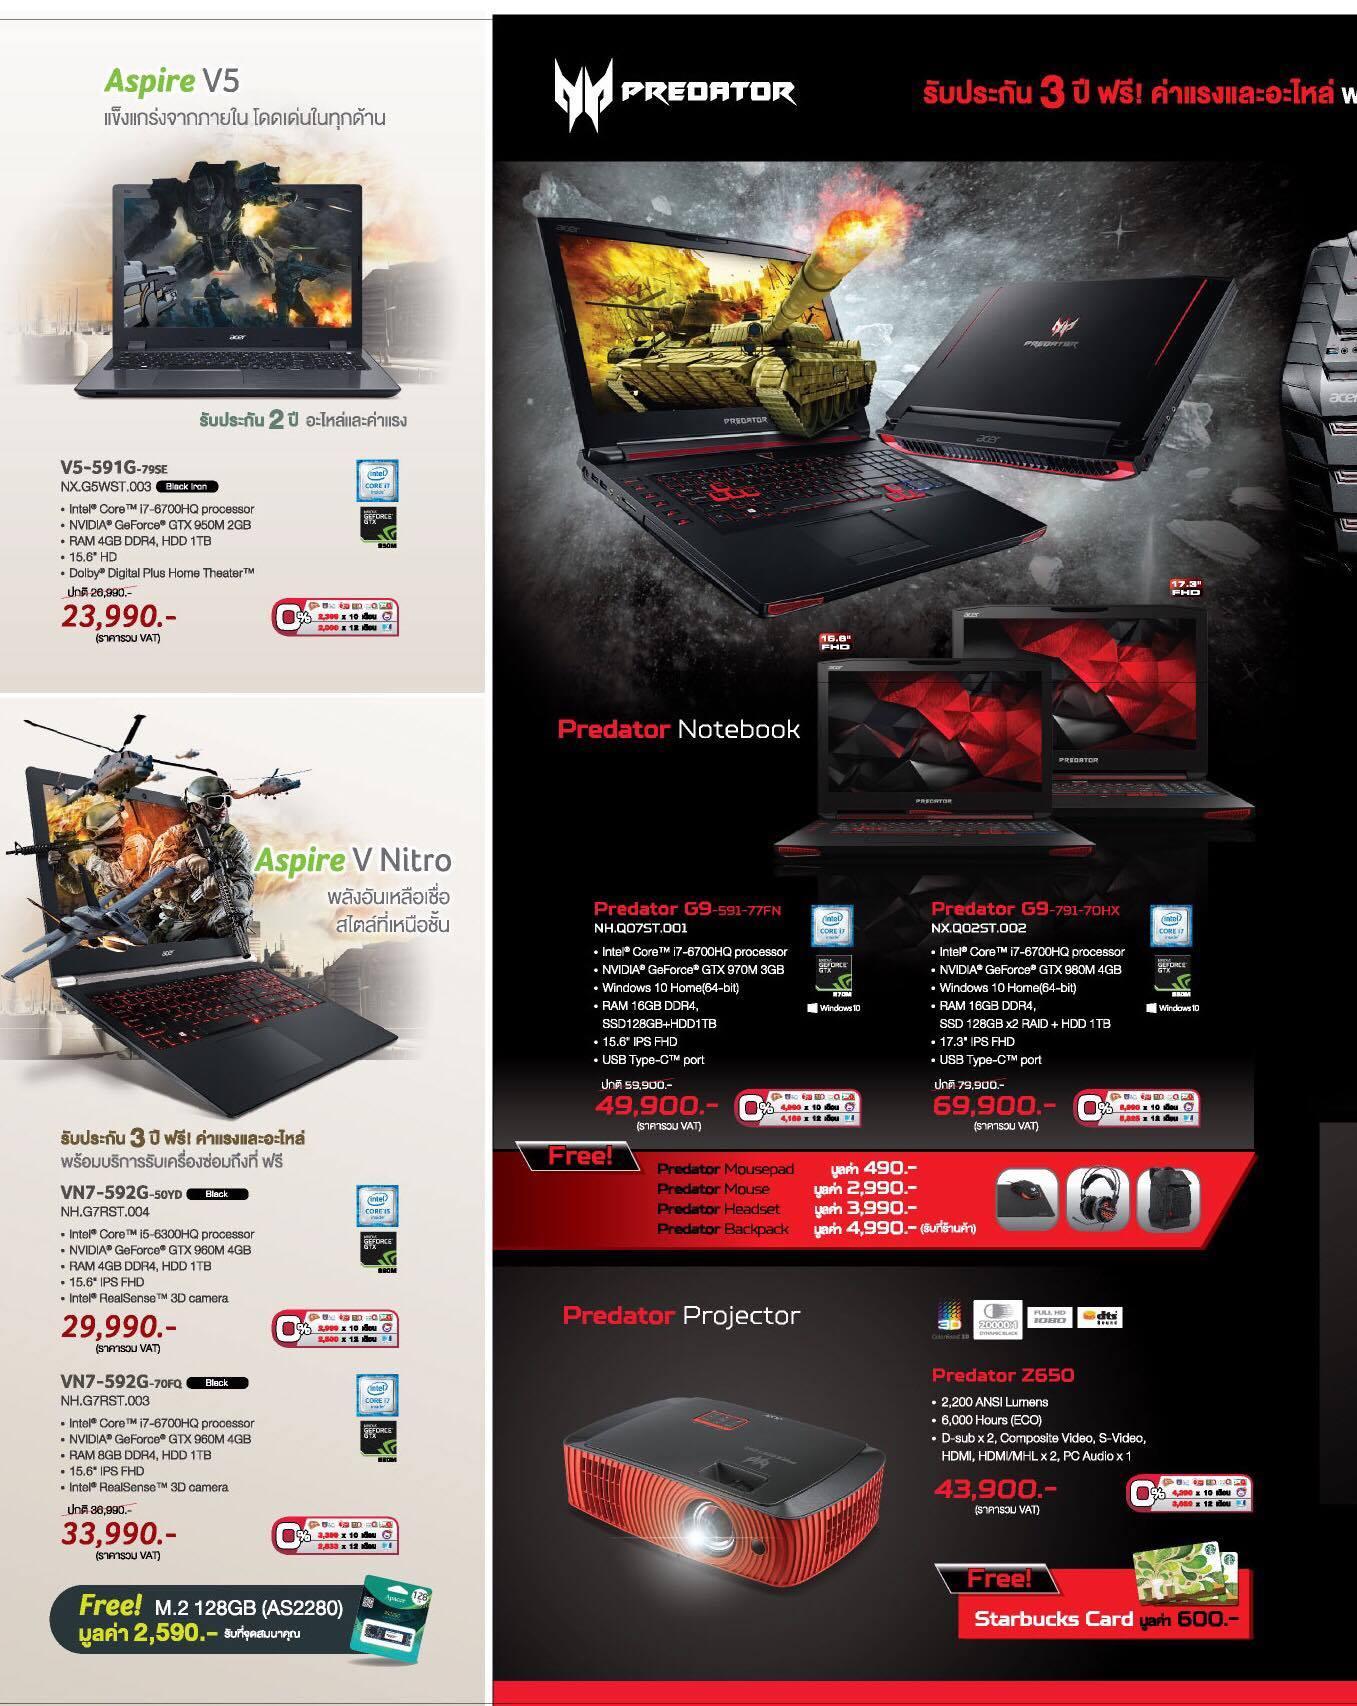 Acer-Commart-Work-2016-SpecPhone-00002